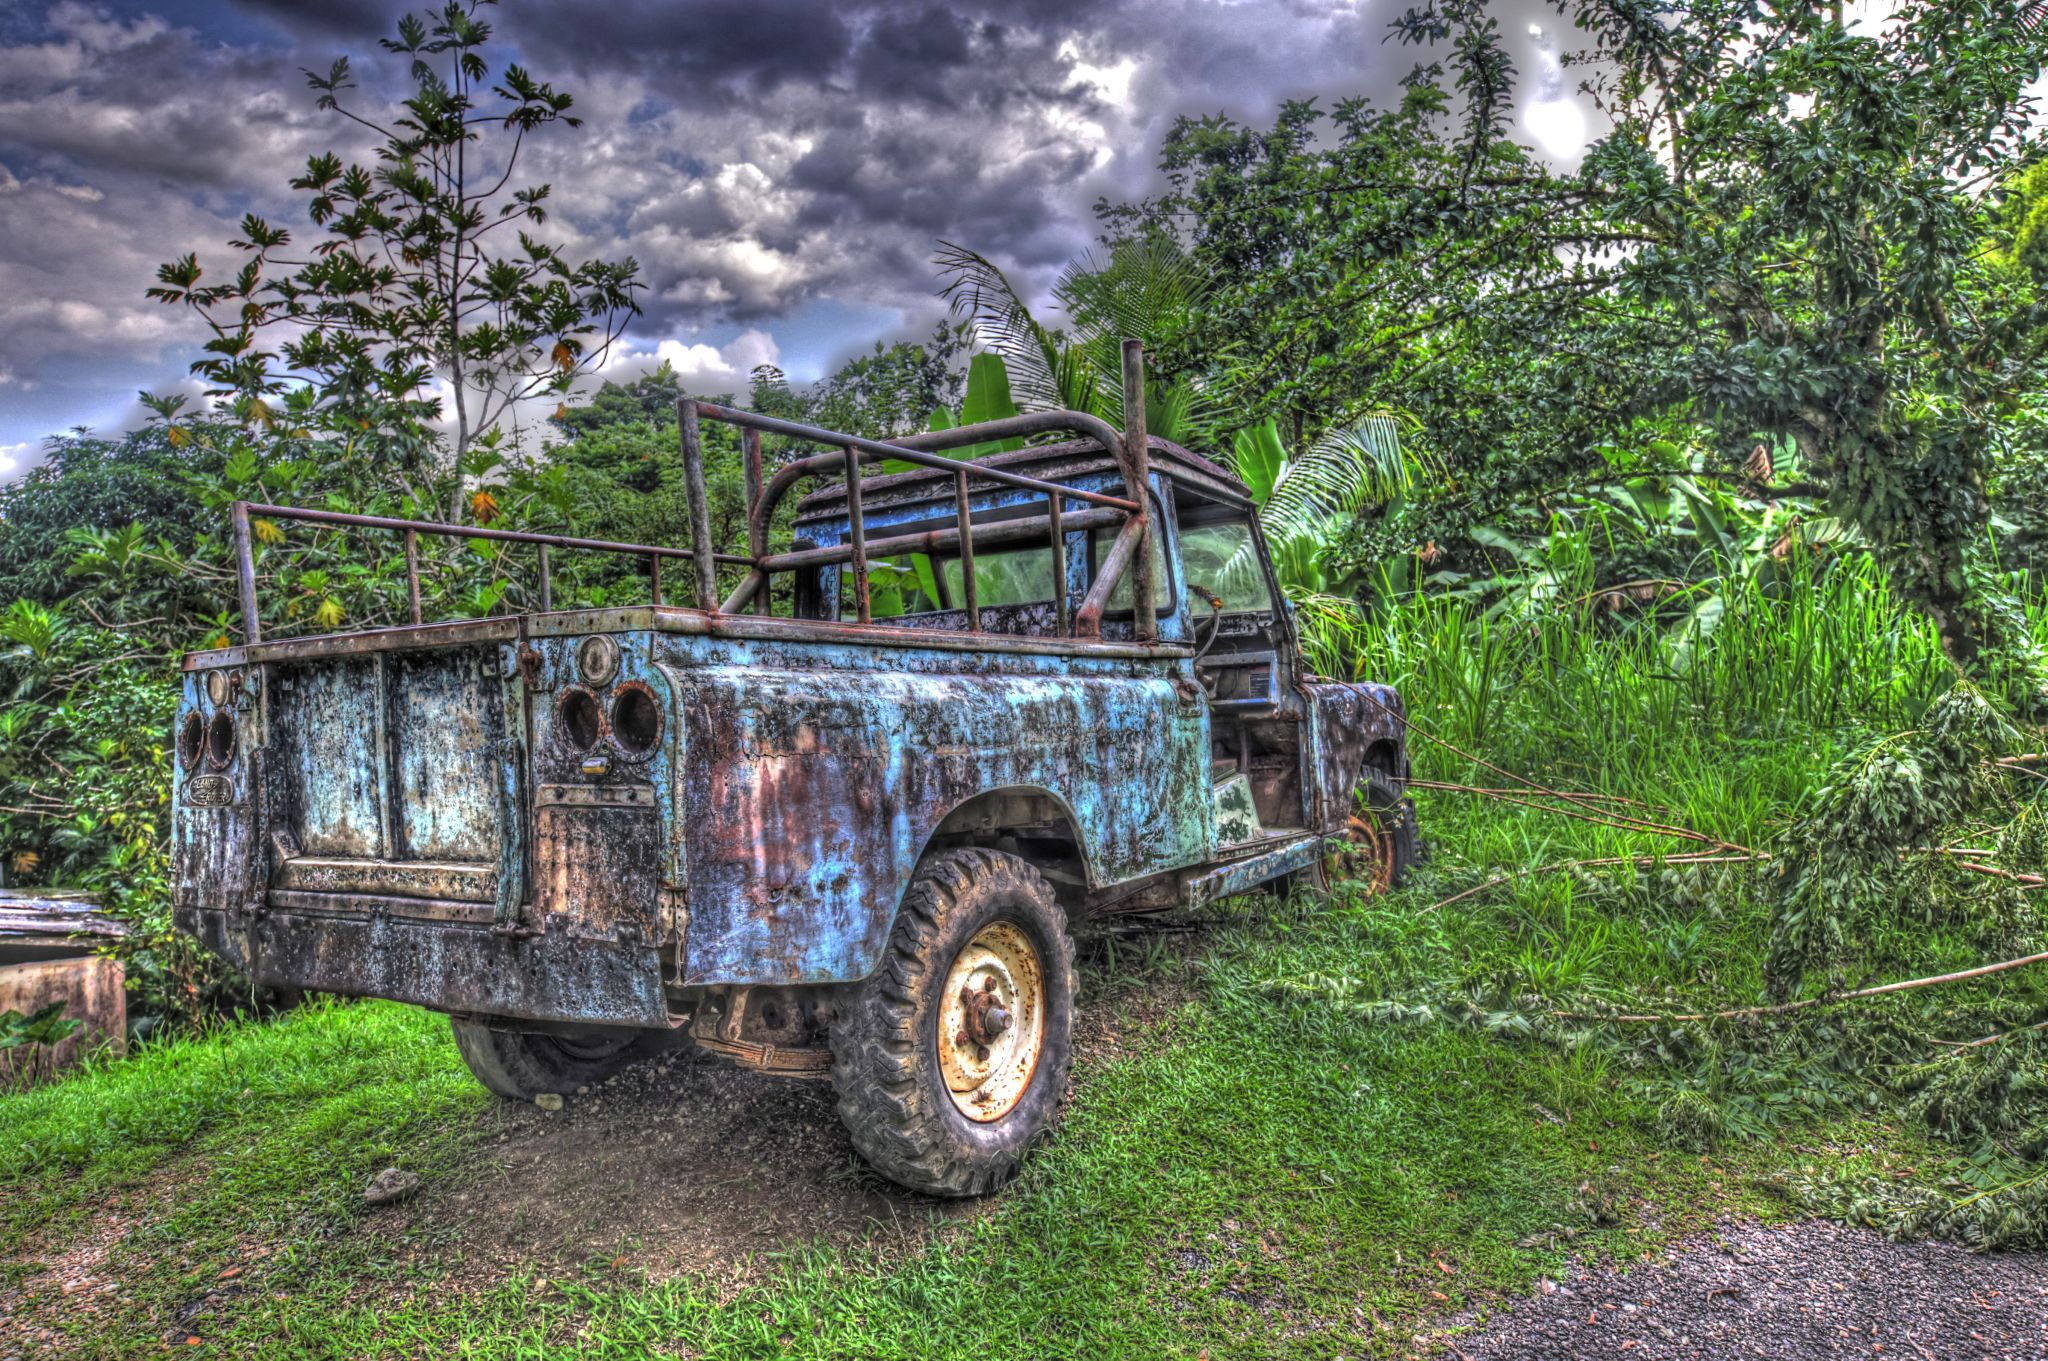 Abandoned Rover in Catatupa, Jamaica, Jamaica